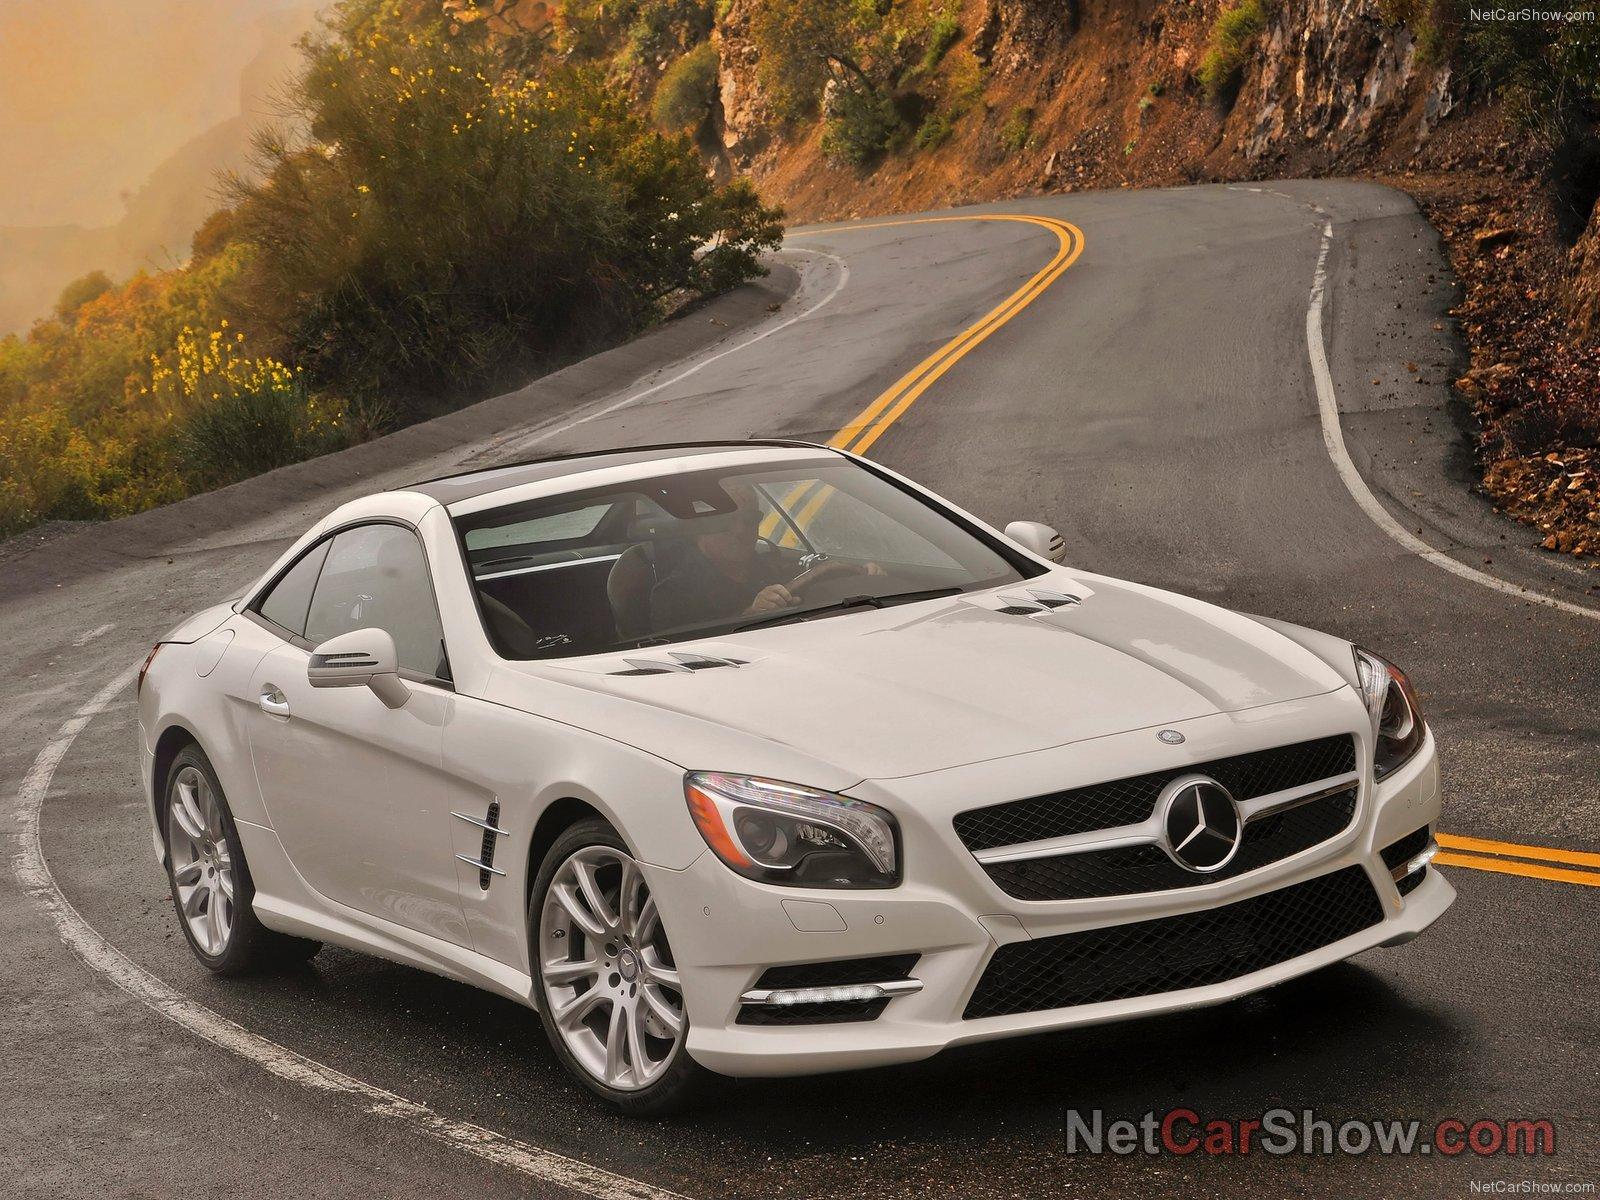 Mercedes benz sl550 picture 91295 mercedes benz photo for Sl550 mercedes benz